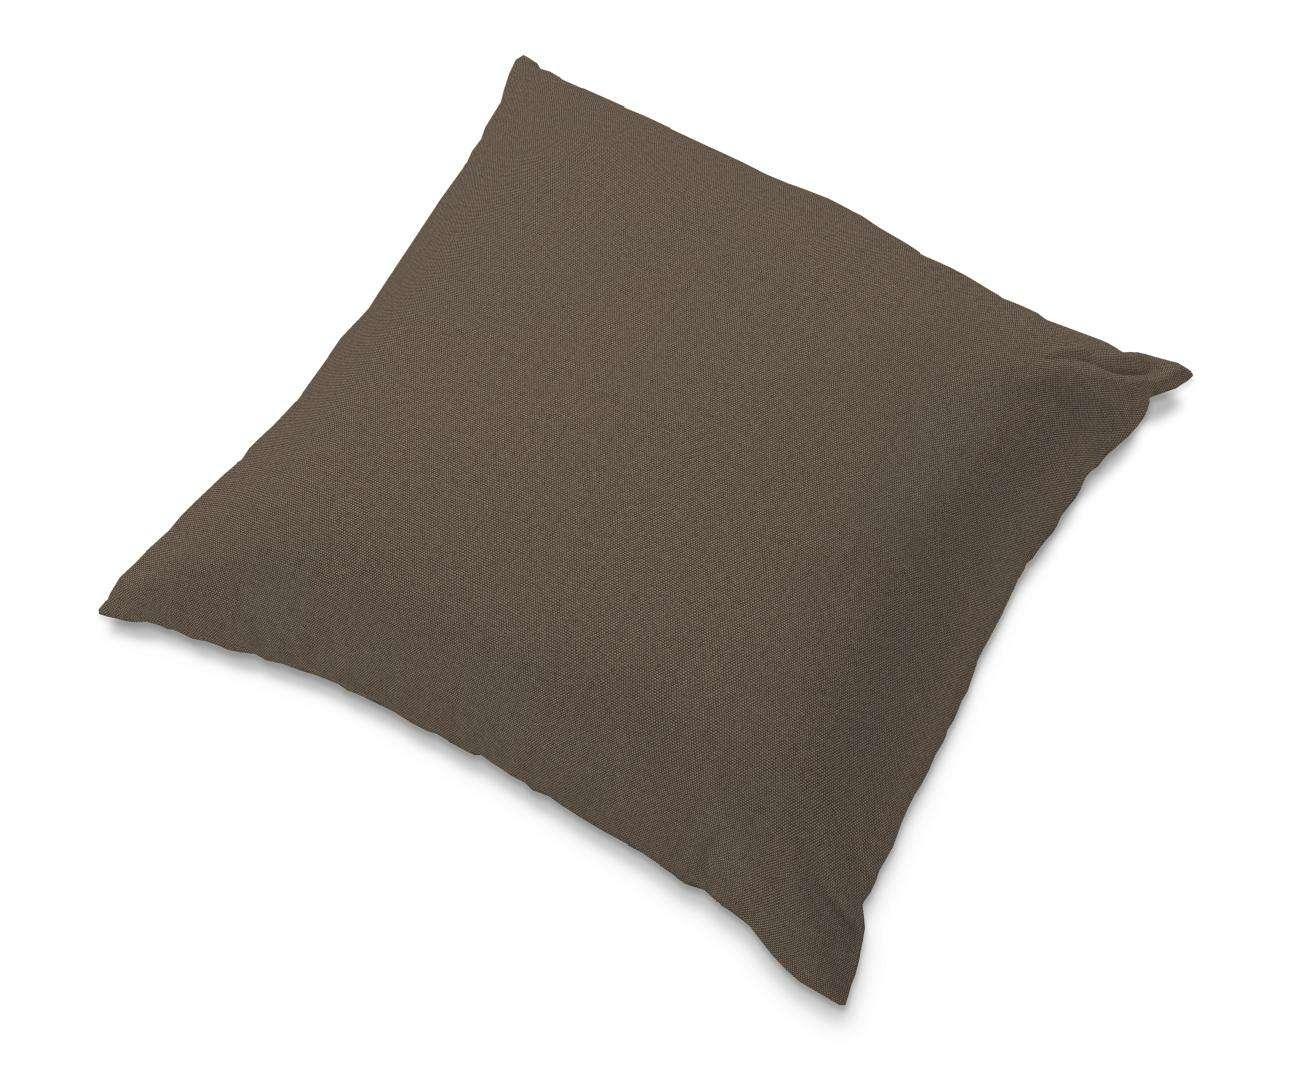 Poszewka Tomelilla 55x55cm w kolekcji Etna, tkanina: 705-08